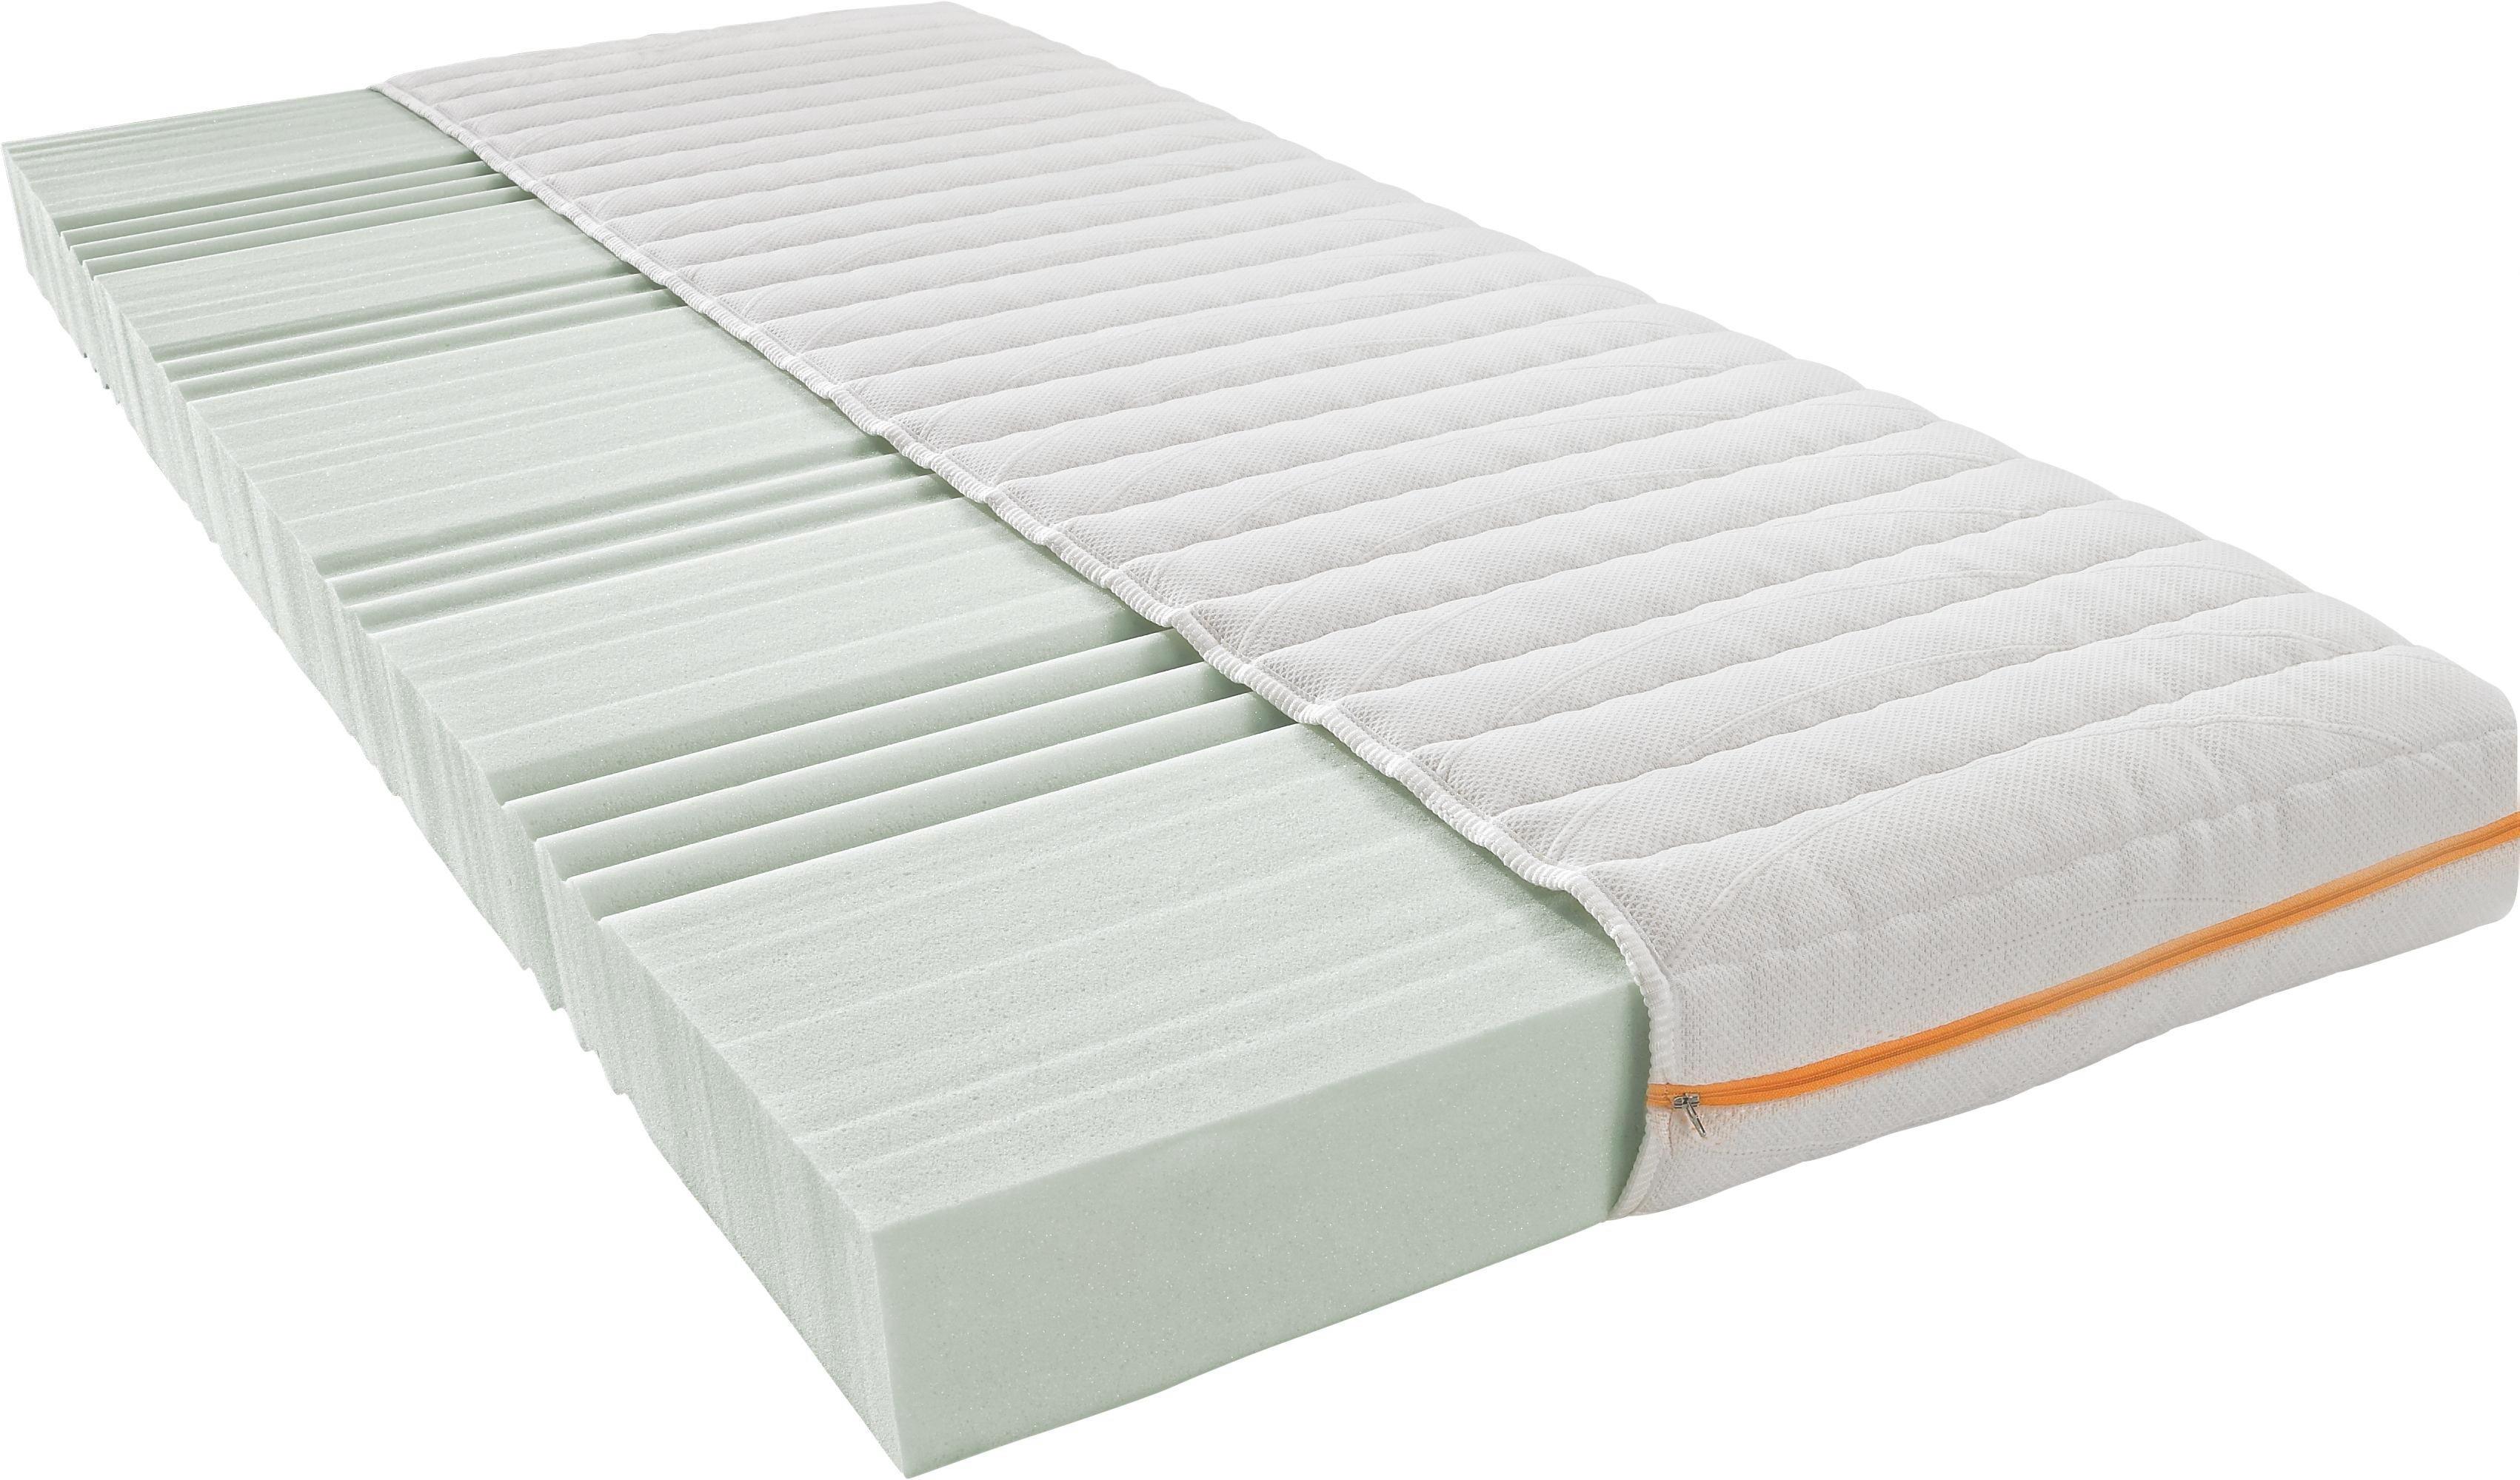 KALLSKUMSMADRASS, 90/200 CM - vit, Basics, textil (90/200cm) - SLEEPTEX